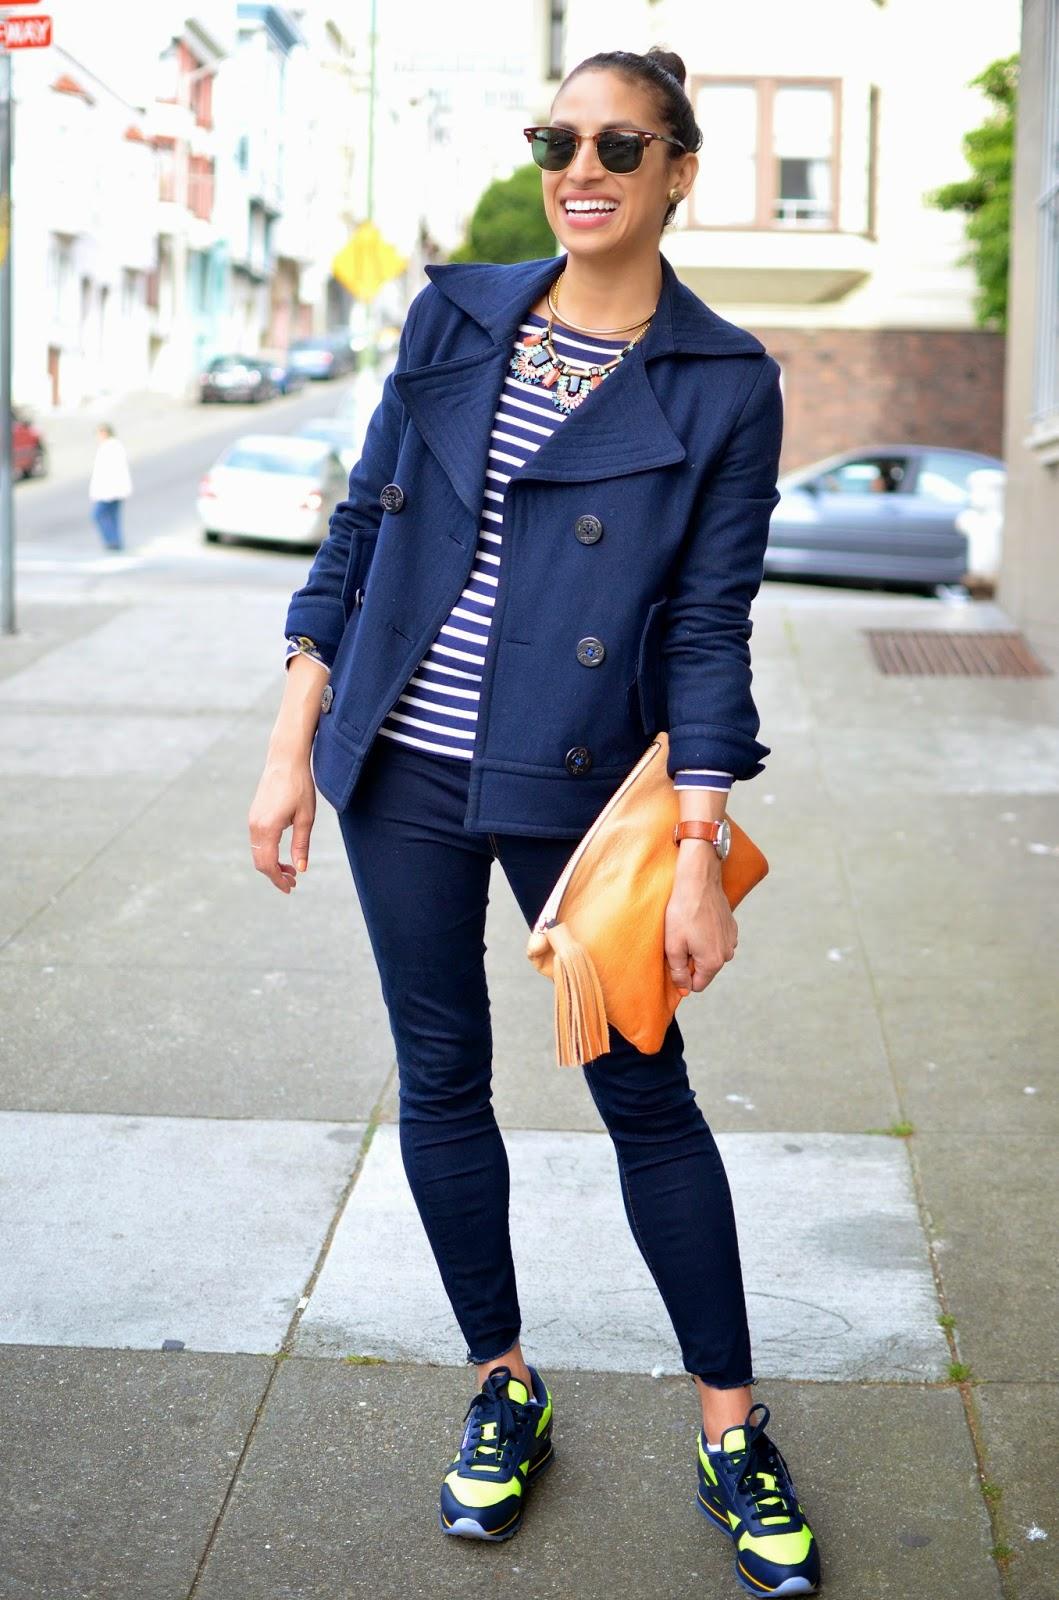 Reebok, custom Reebok, casual city style, casual style, striped top, skinny True Religion denim leggings, vintage chanel earrings, navy pea coat,